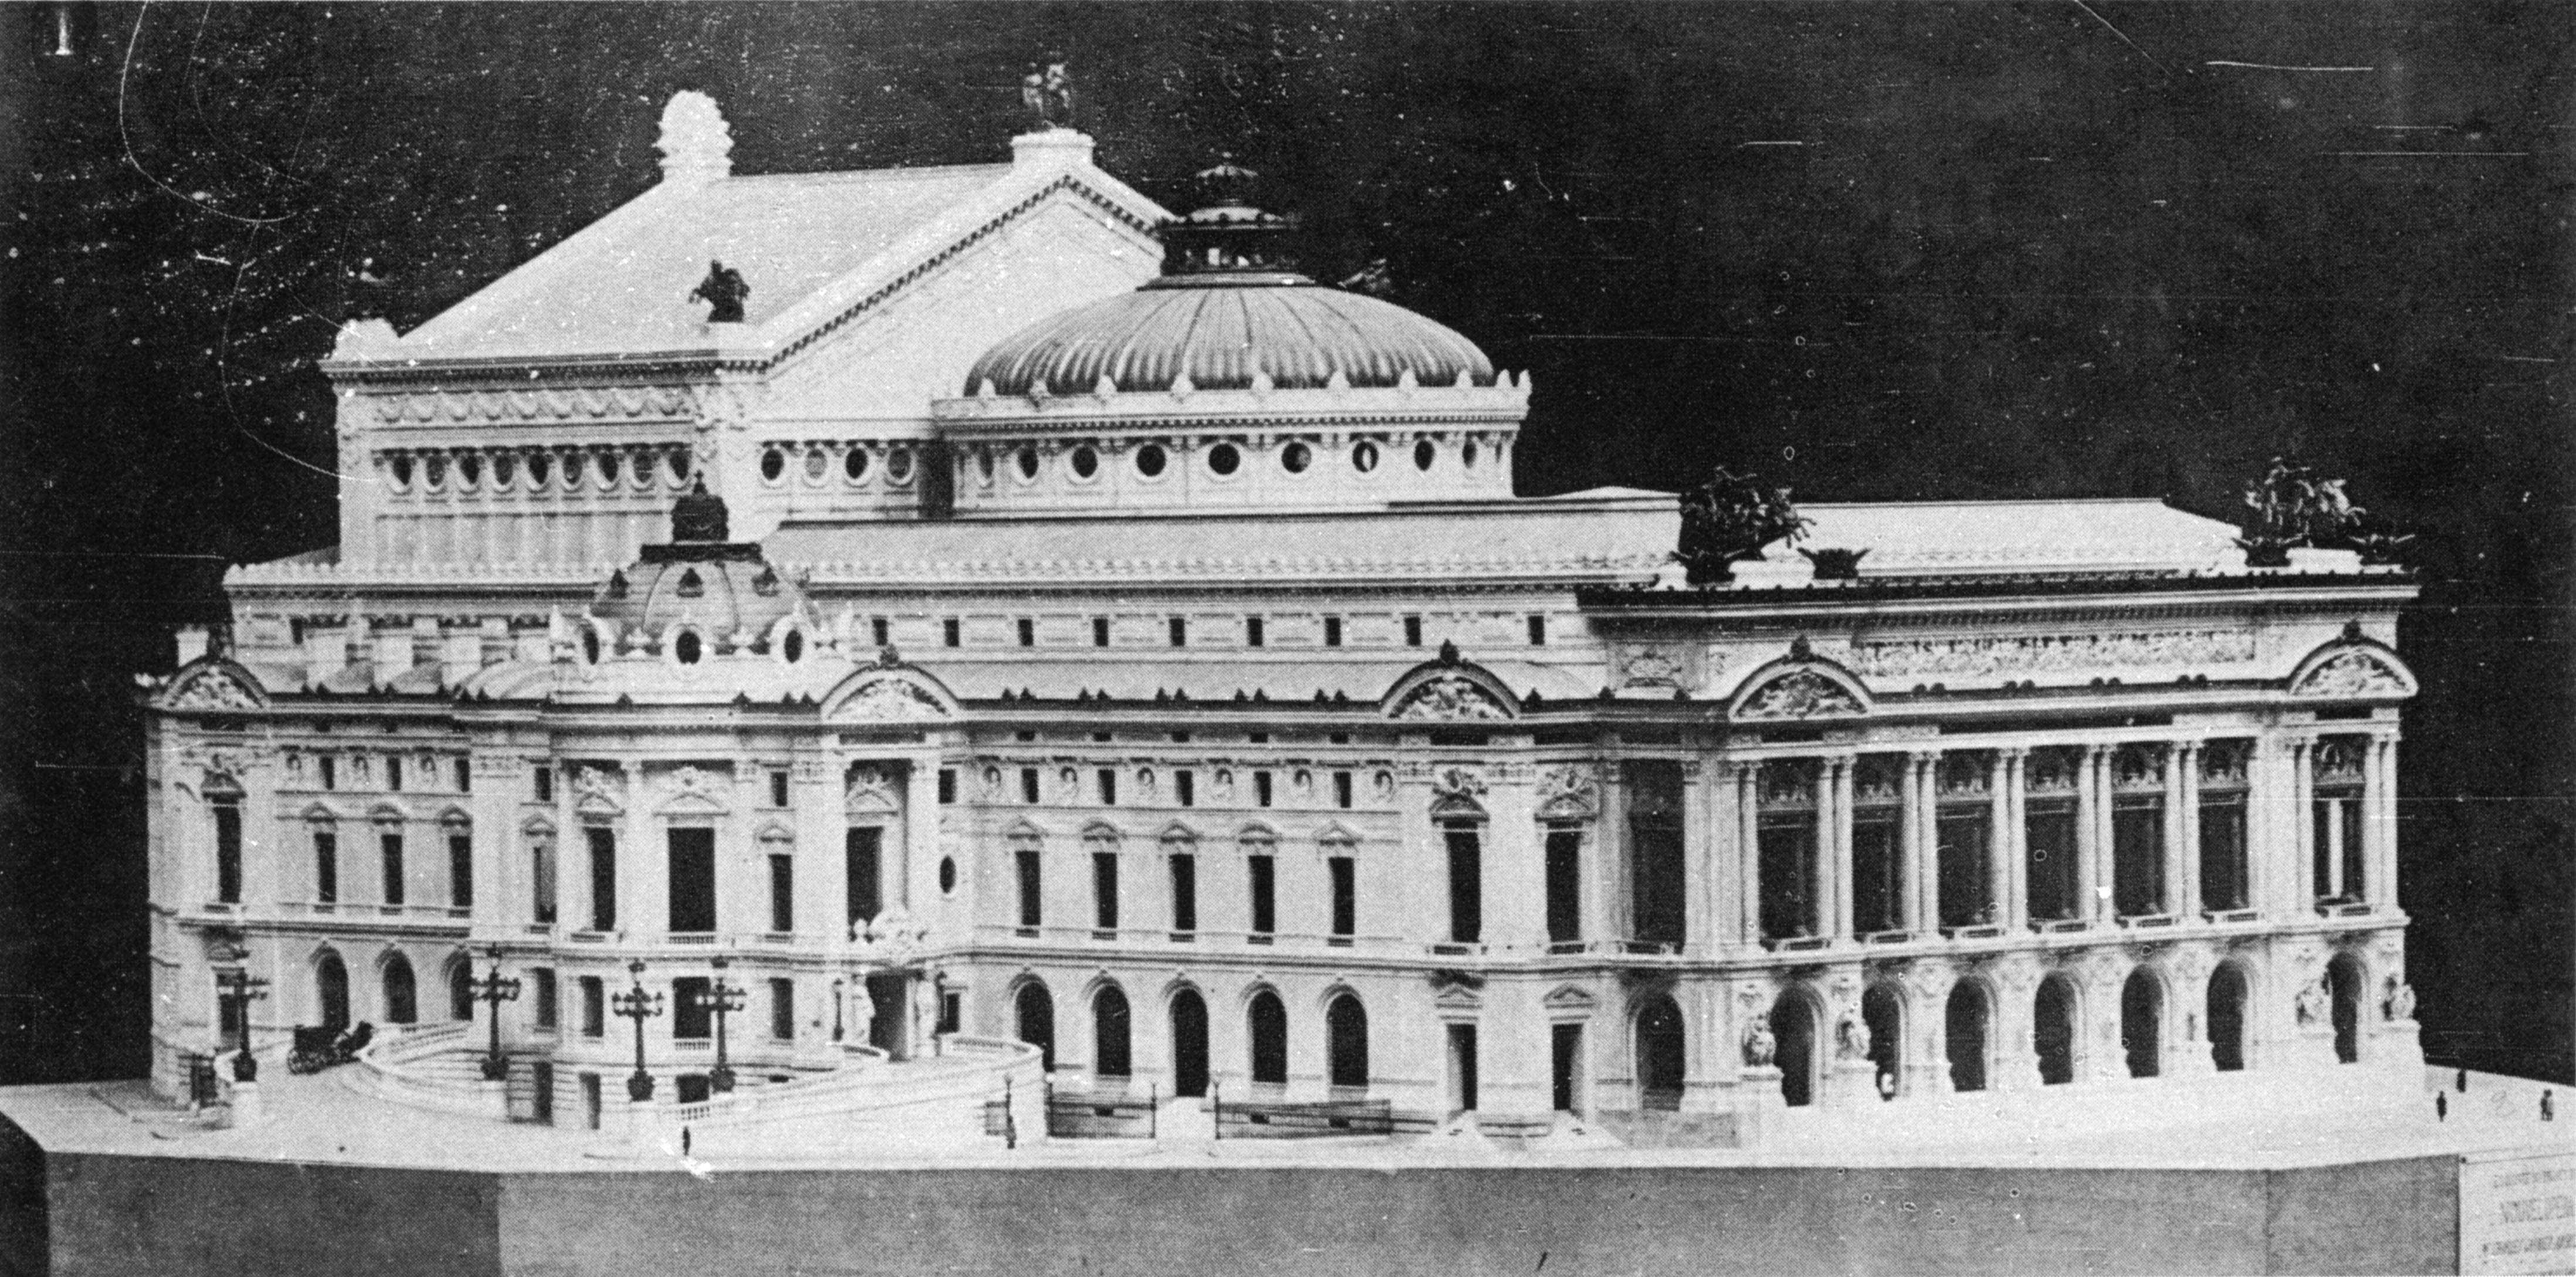 New York Floor Plans File Palais Garnier Model By Villeminot Mead 1991 P150